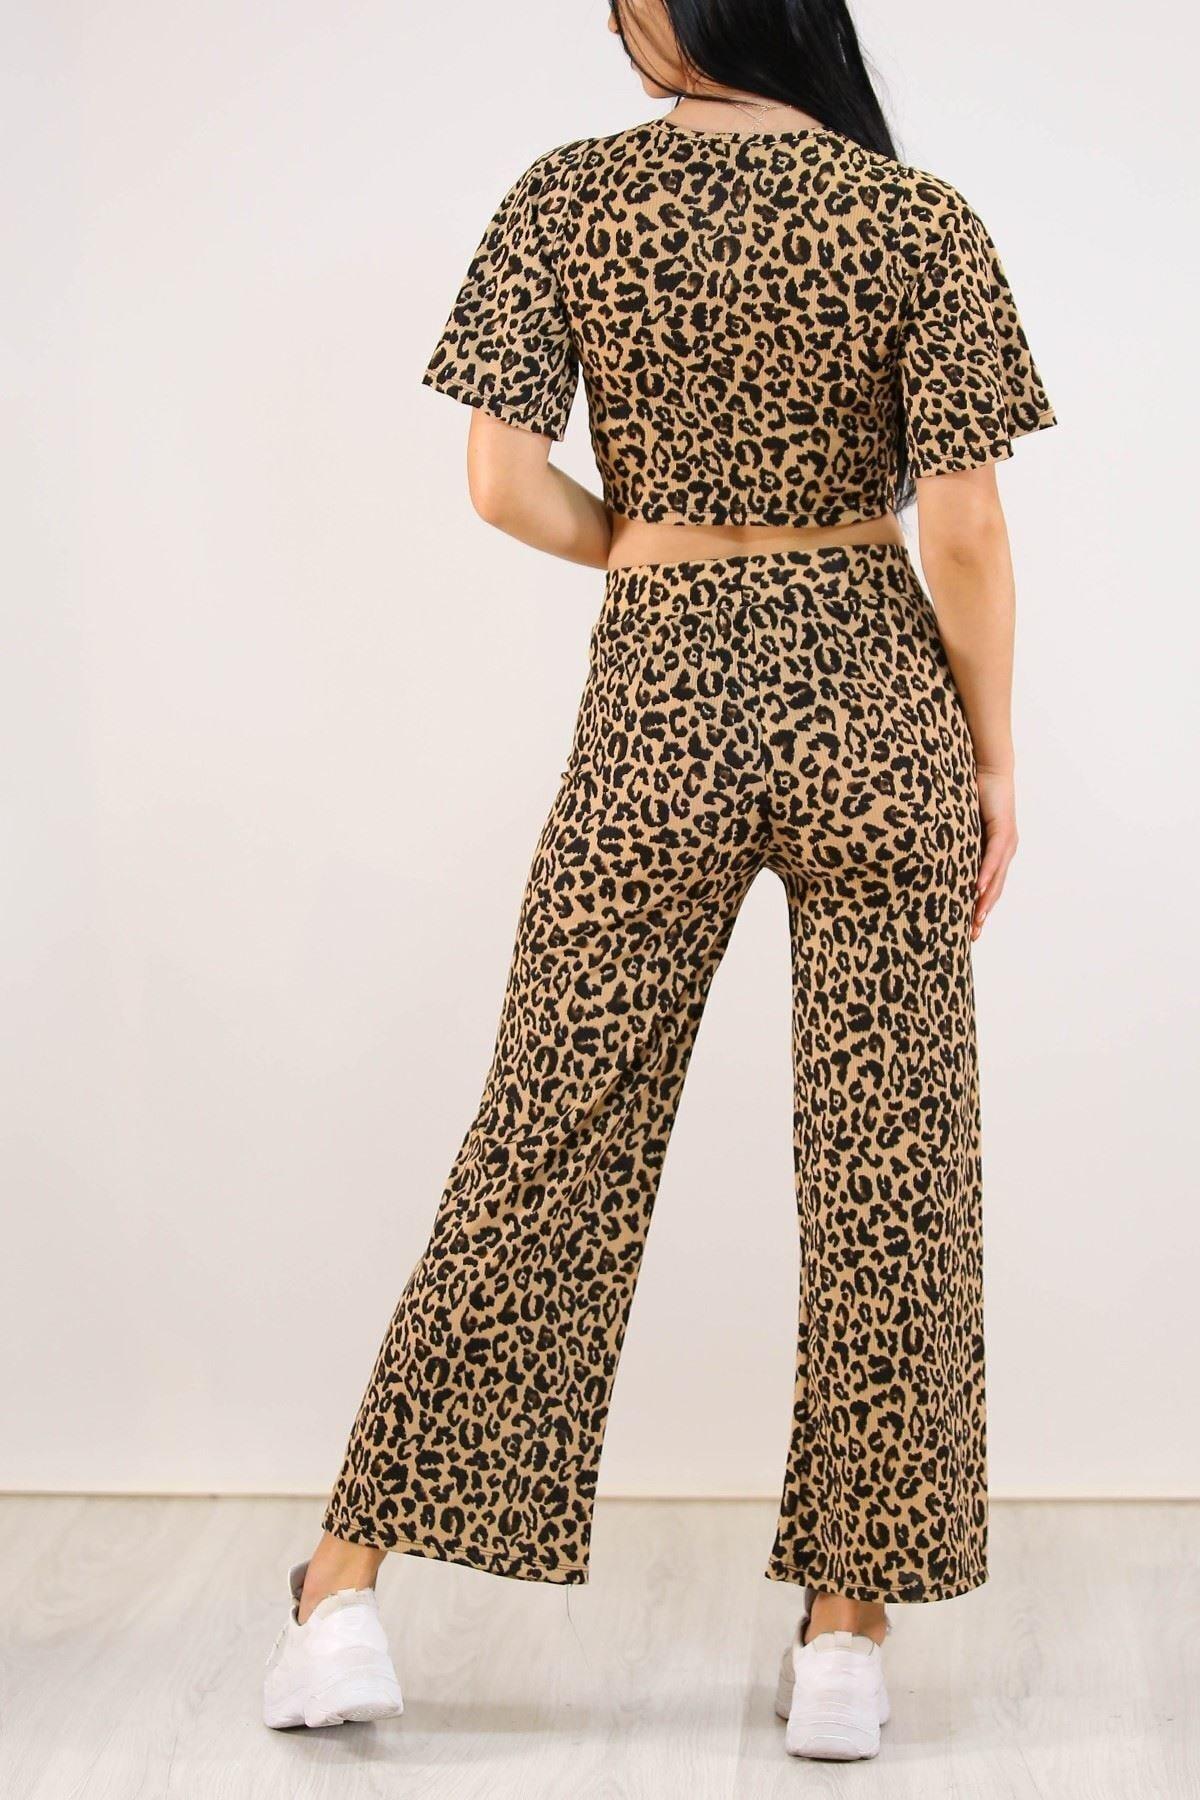 Kısa Kol Leopar Pantolon Takım